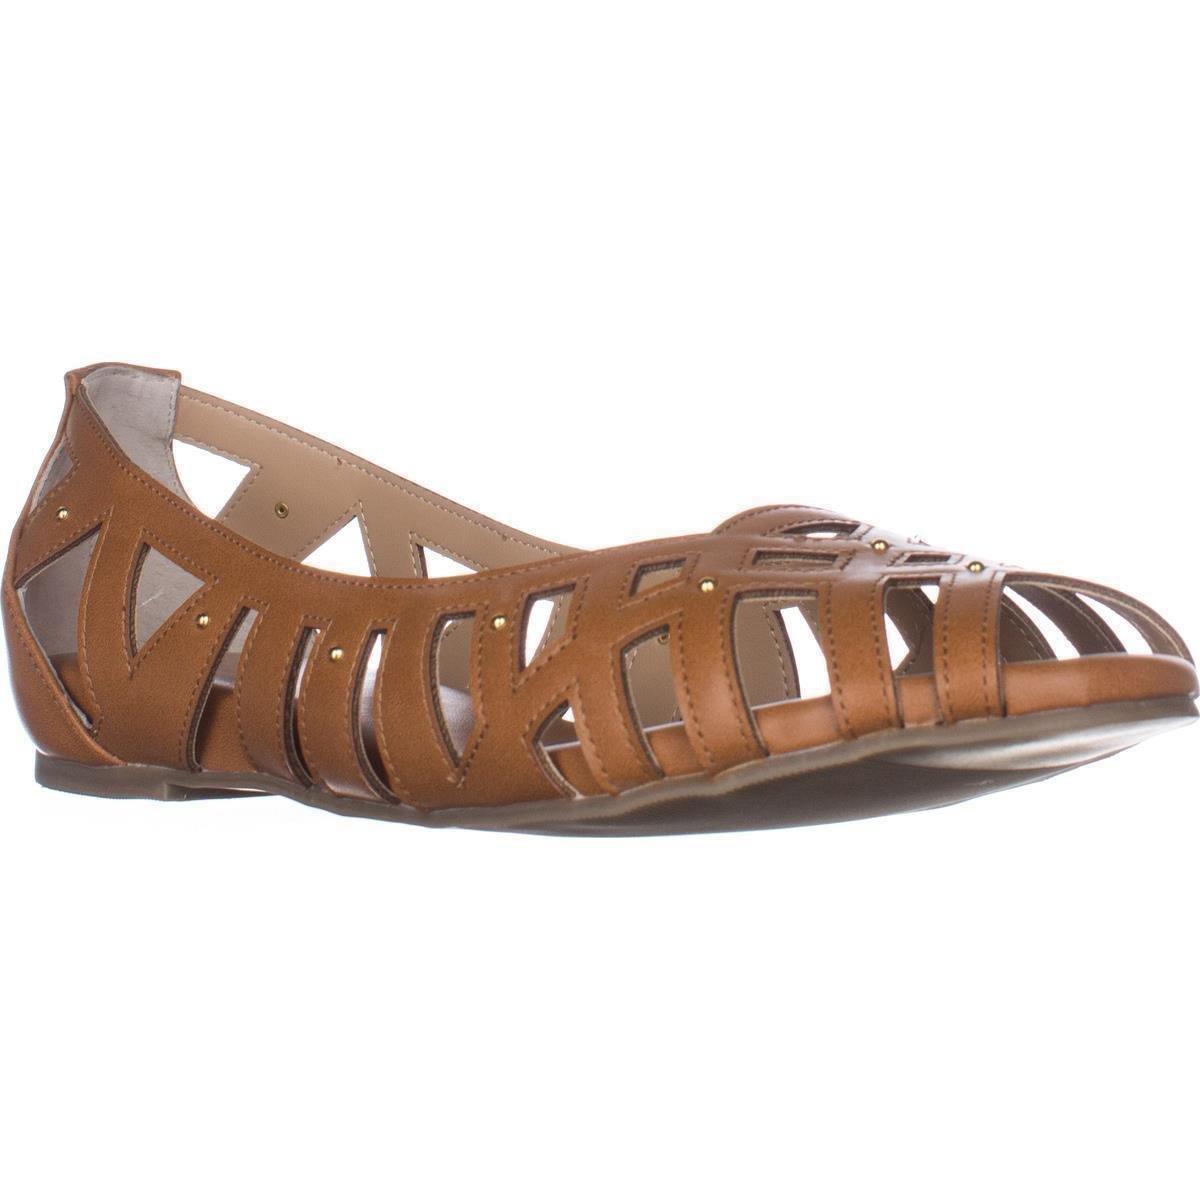 Thalia Sodi Womens Zuly Peep Toe Loafers B079K3JNRS 7 B(M) US|Cognac